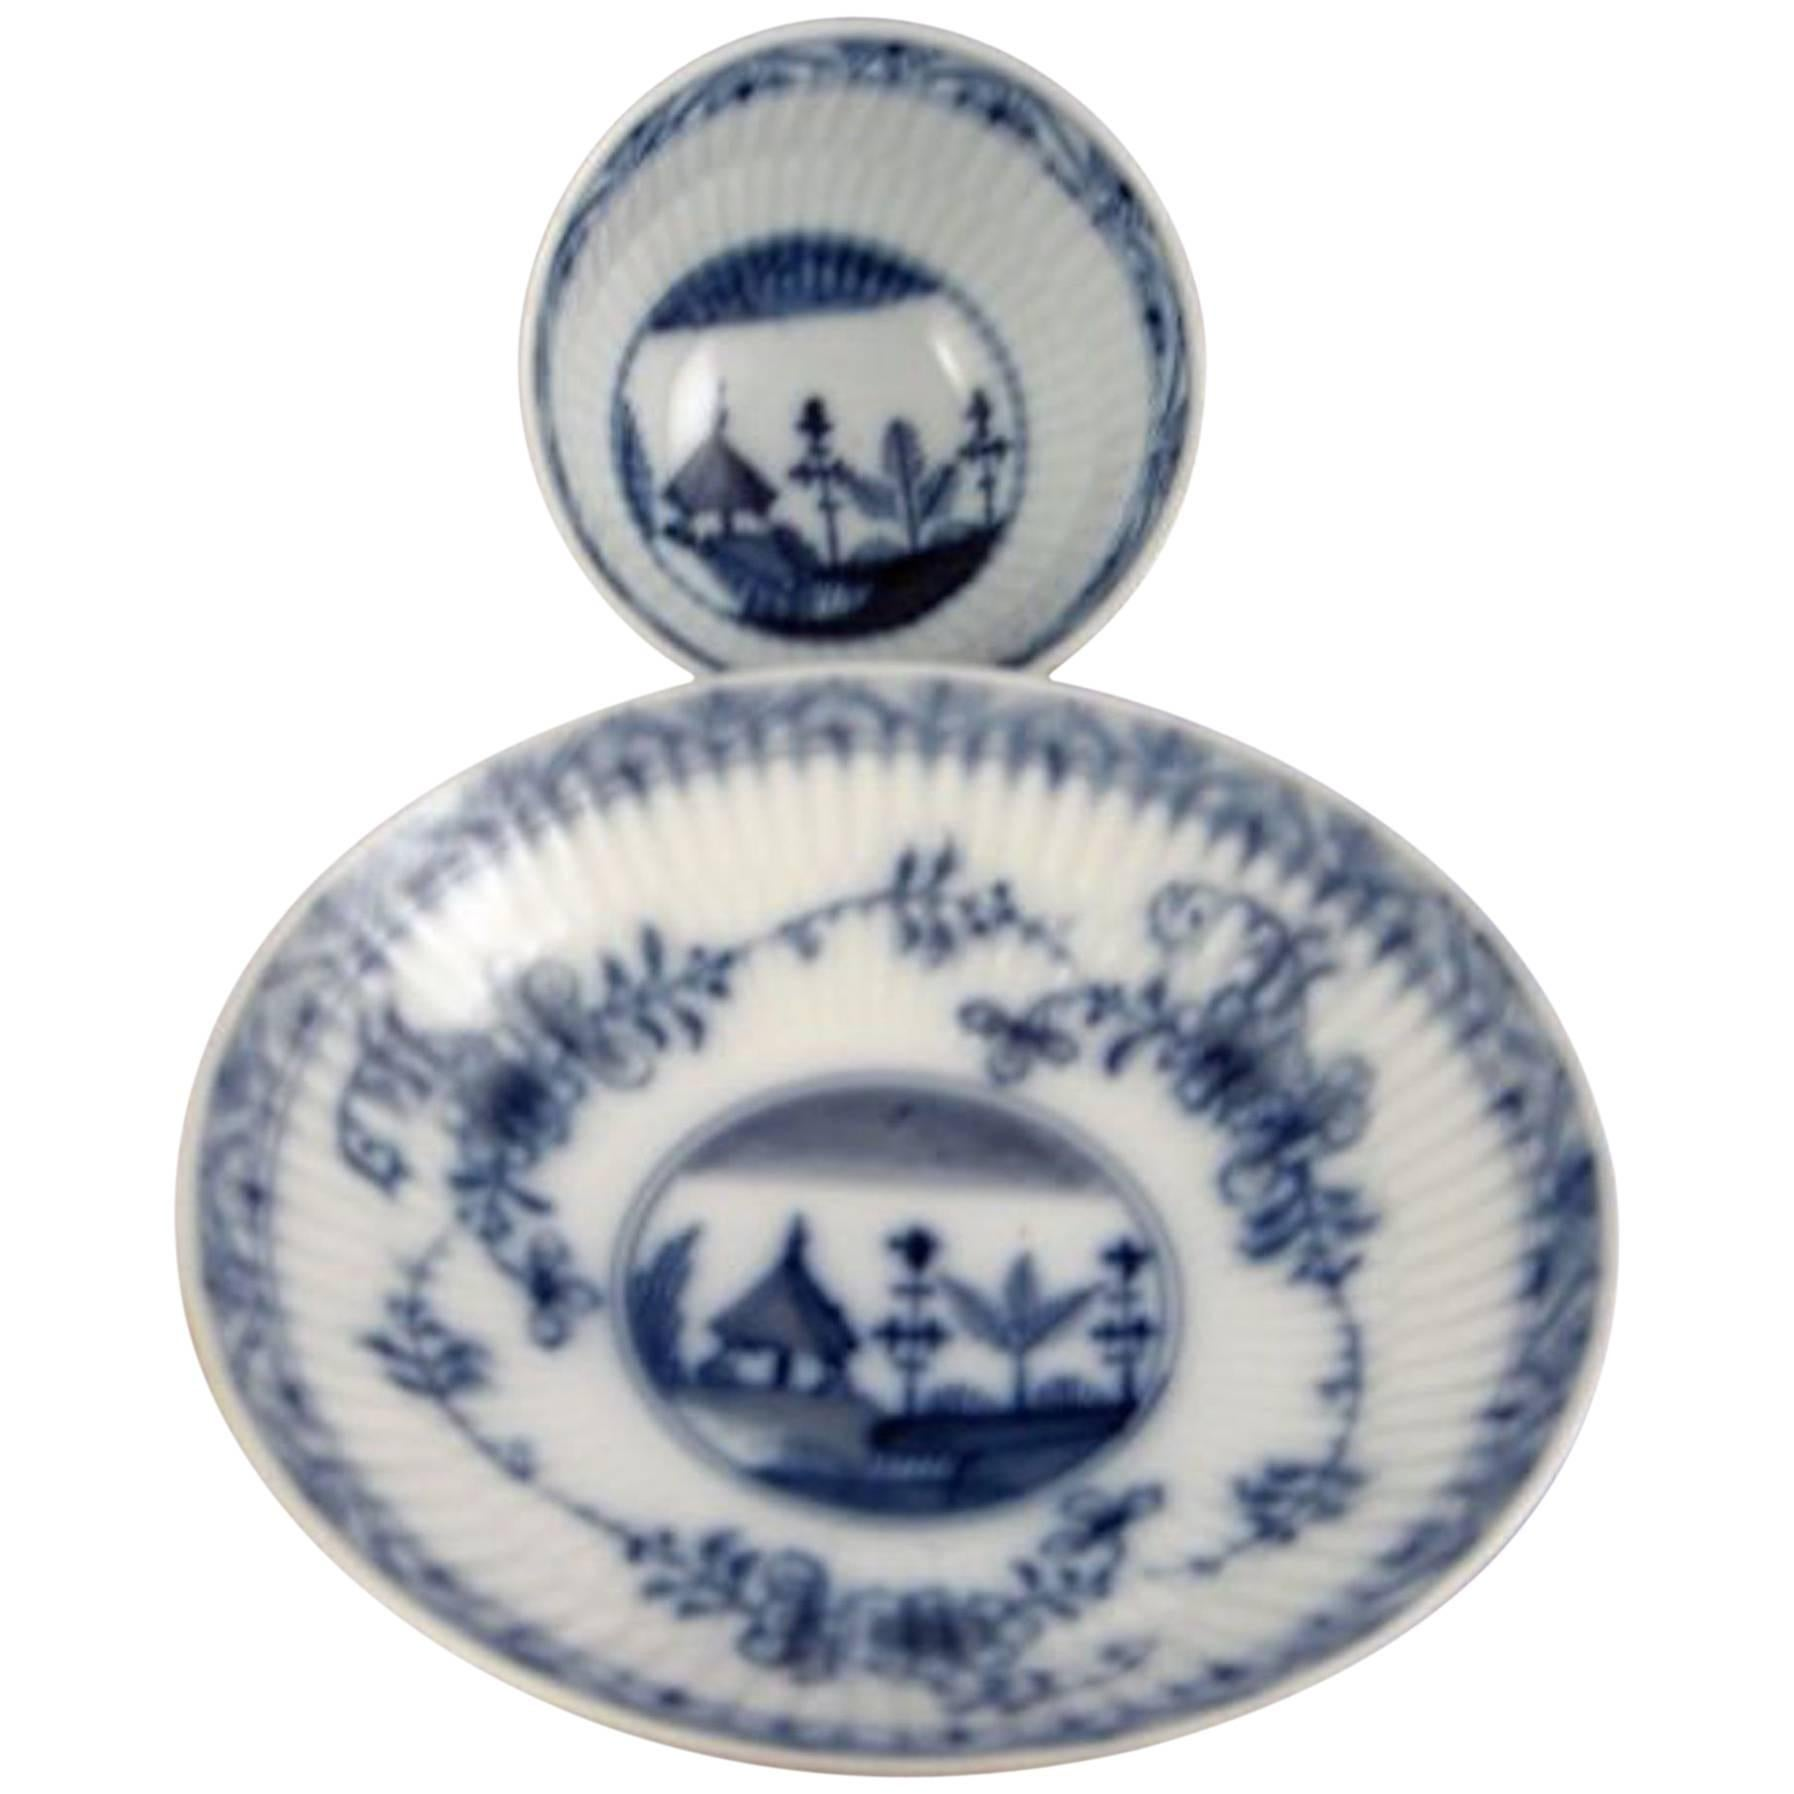 18th Century Antique Meissen Porcelain Cup and Saucer Marcolini